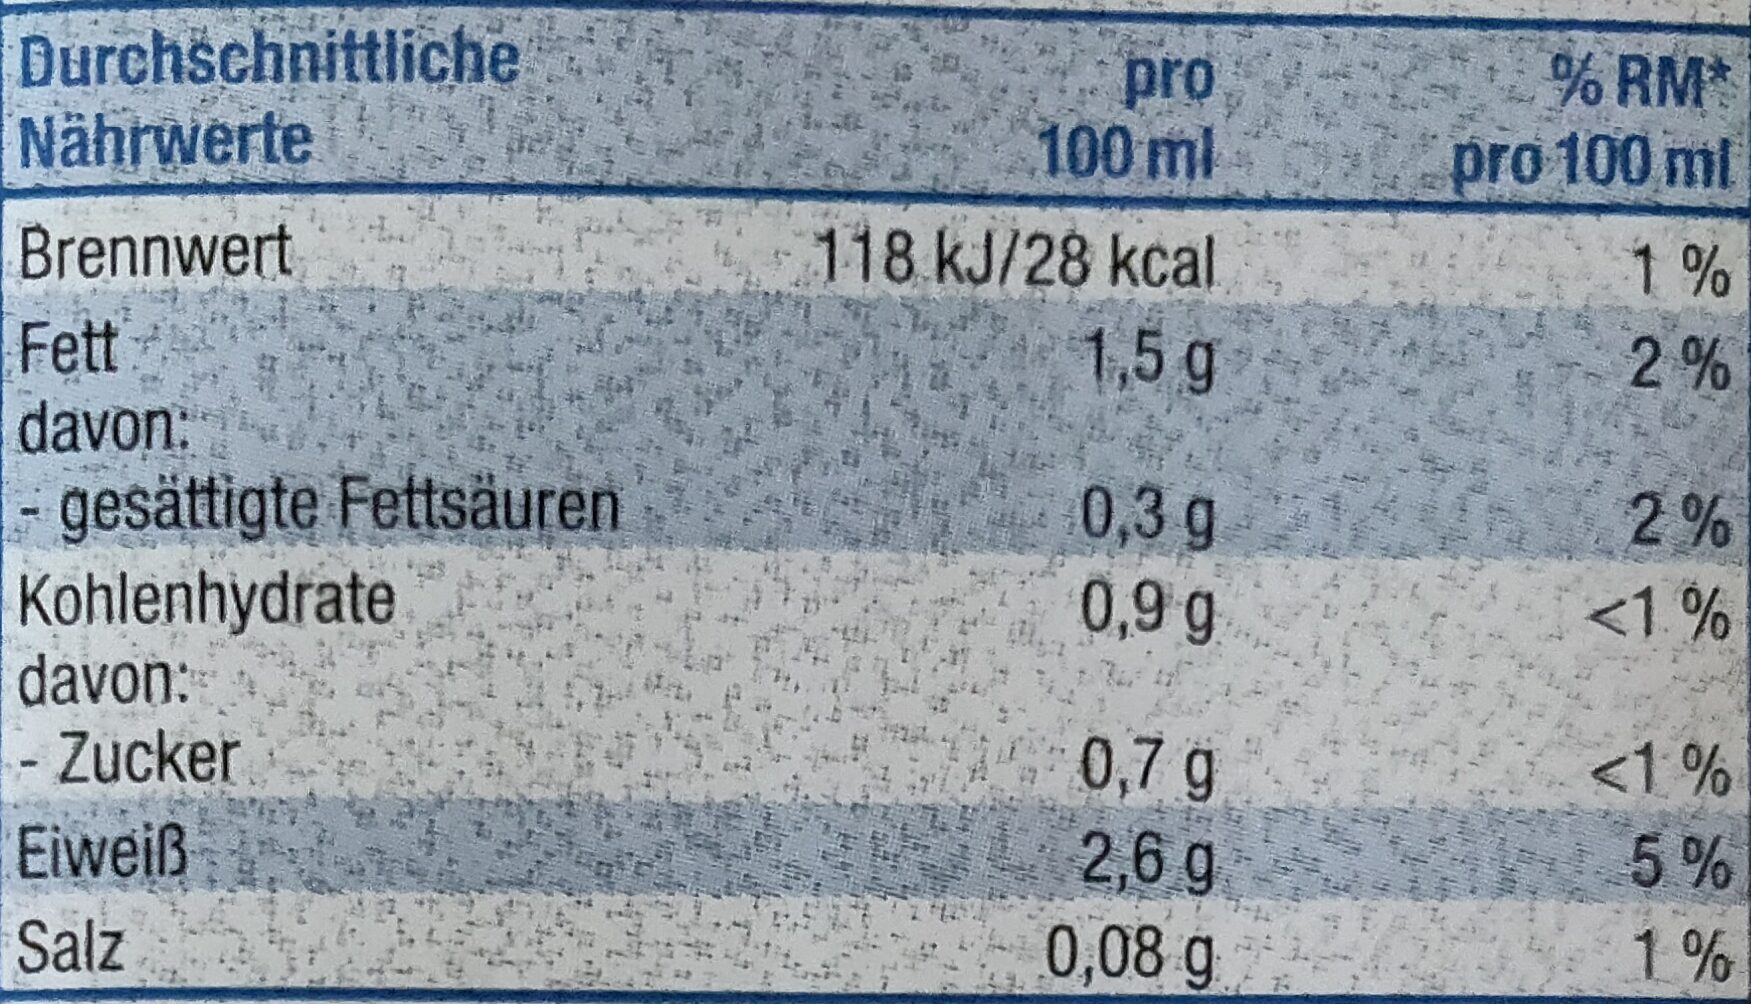 Soja Naturell Drink - Informations nutritionnelles - de